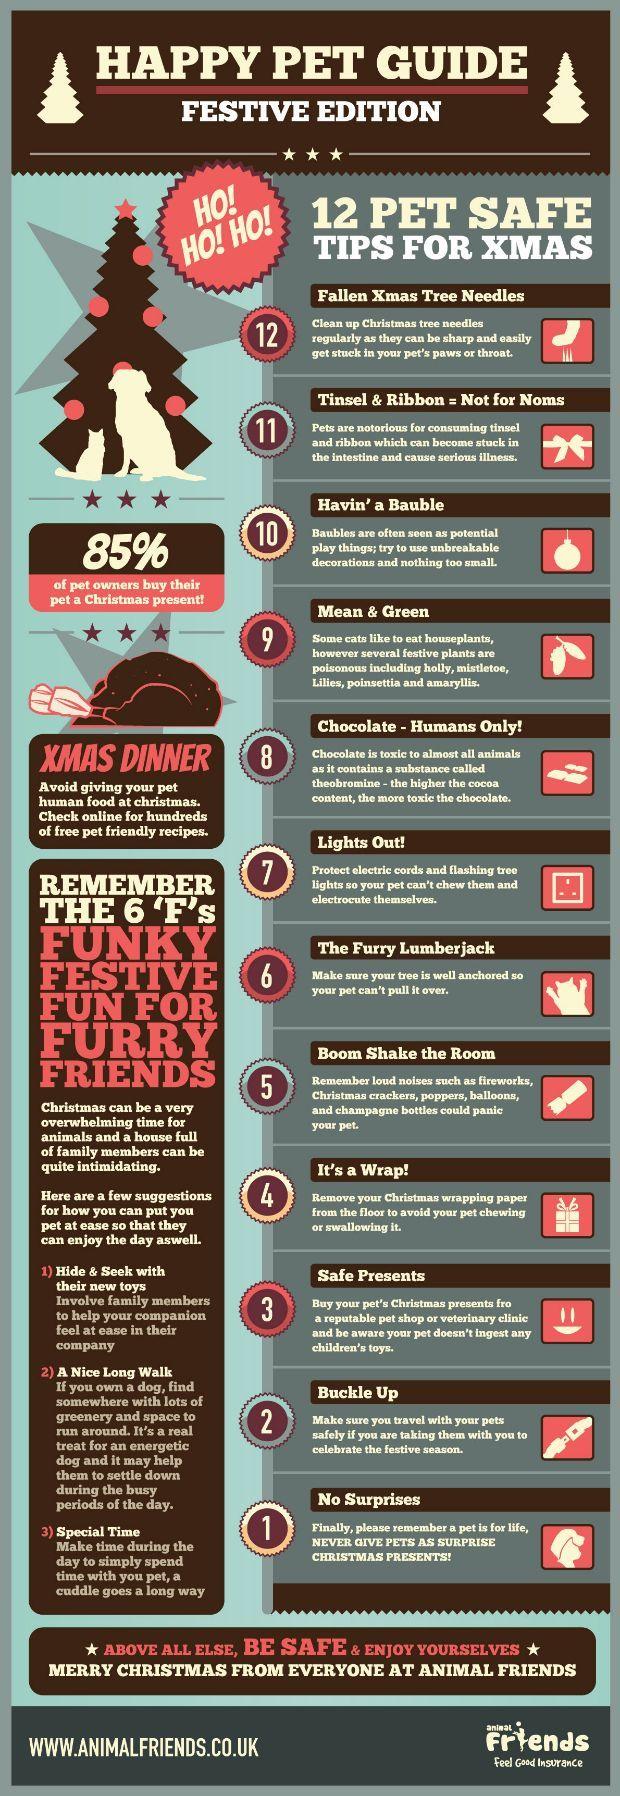 12 Pet Safety Tips For Christmas Pet Holiday Pet Safe Pet Hacks